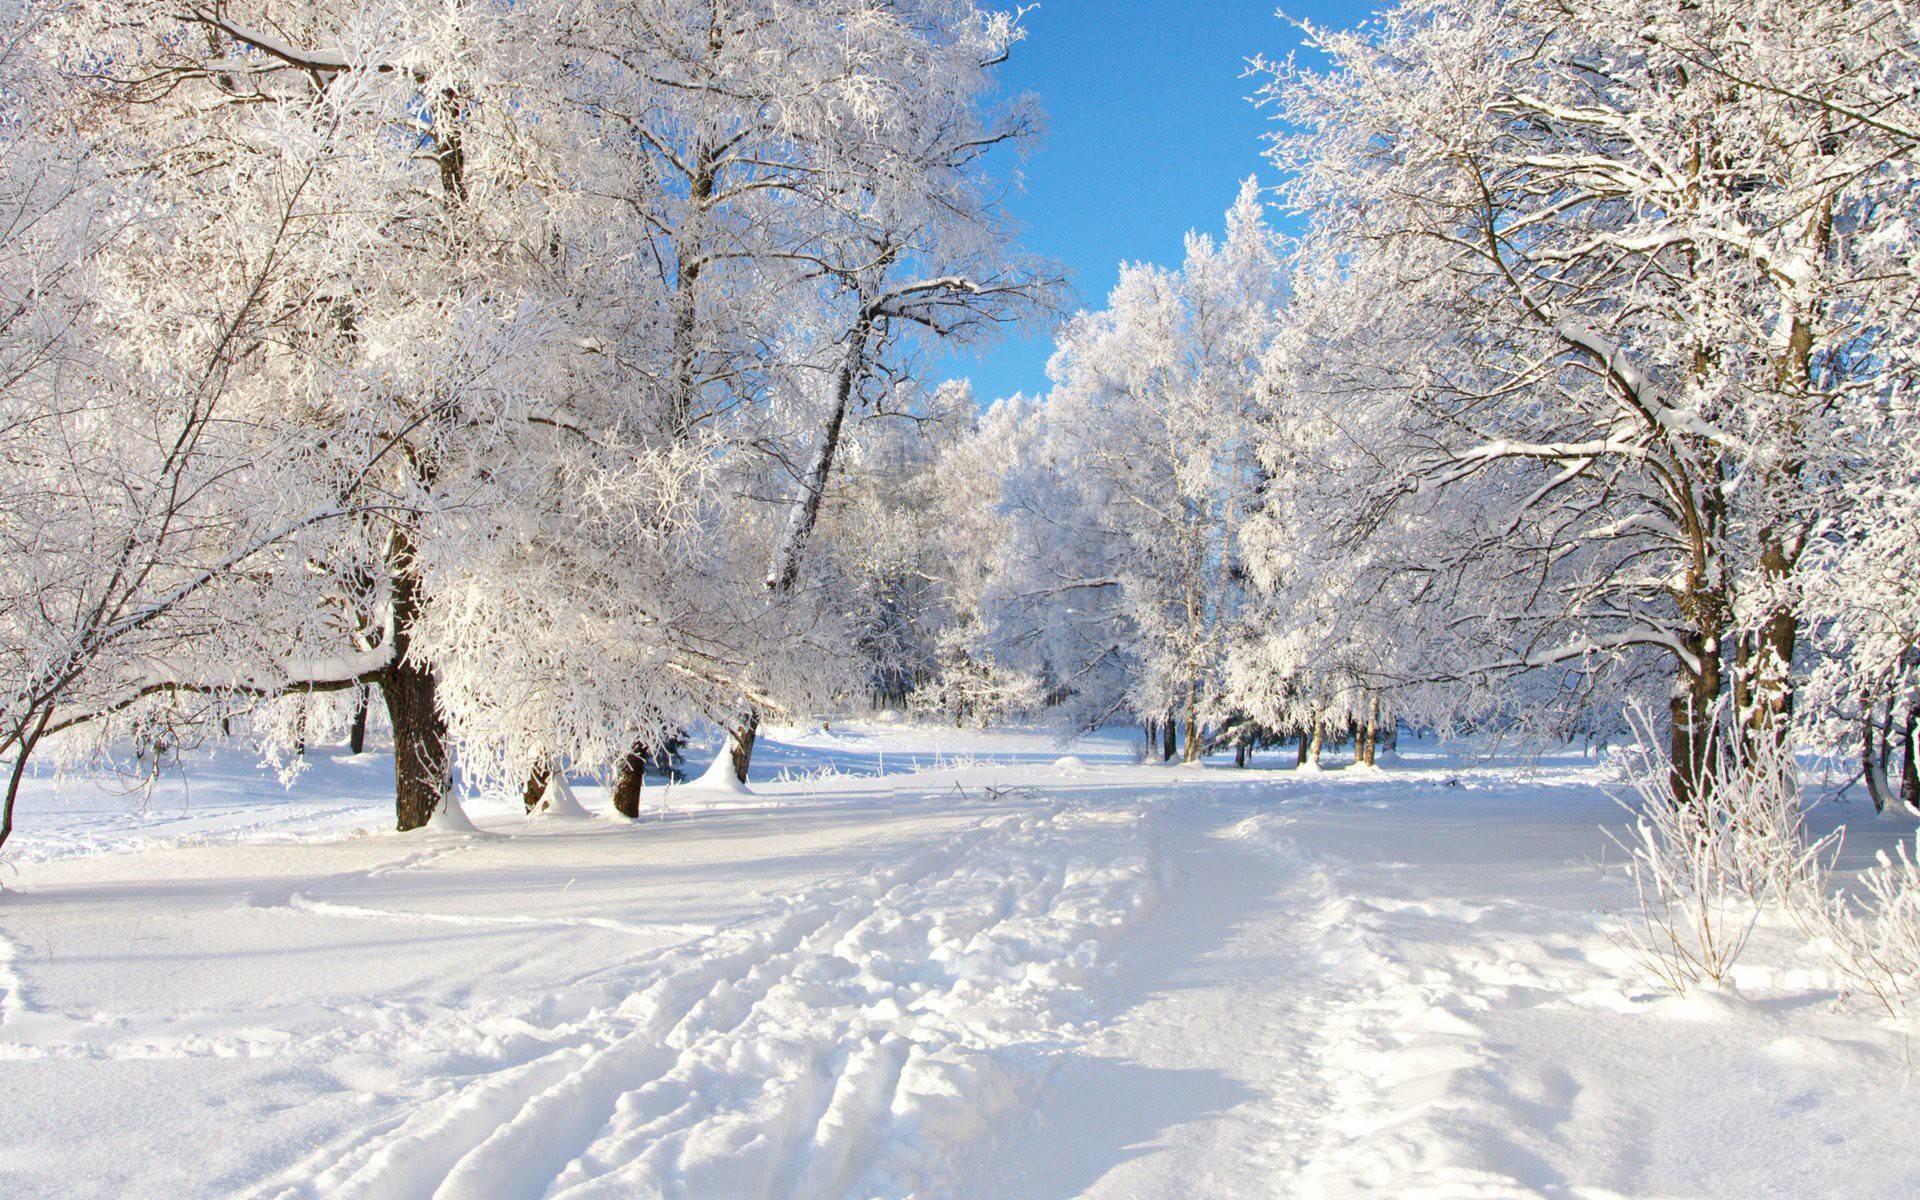 Free Winter Desktop Wallpaper, Download Winter Wallpapers